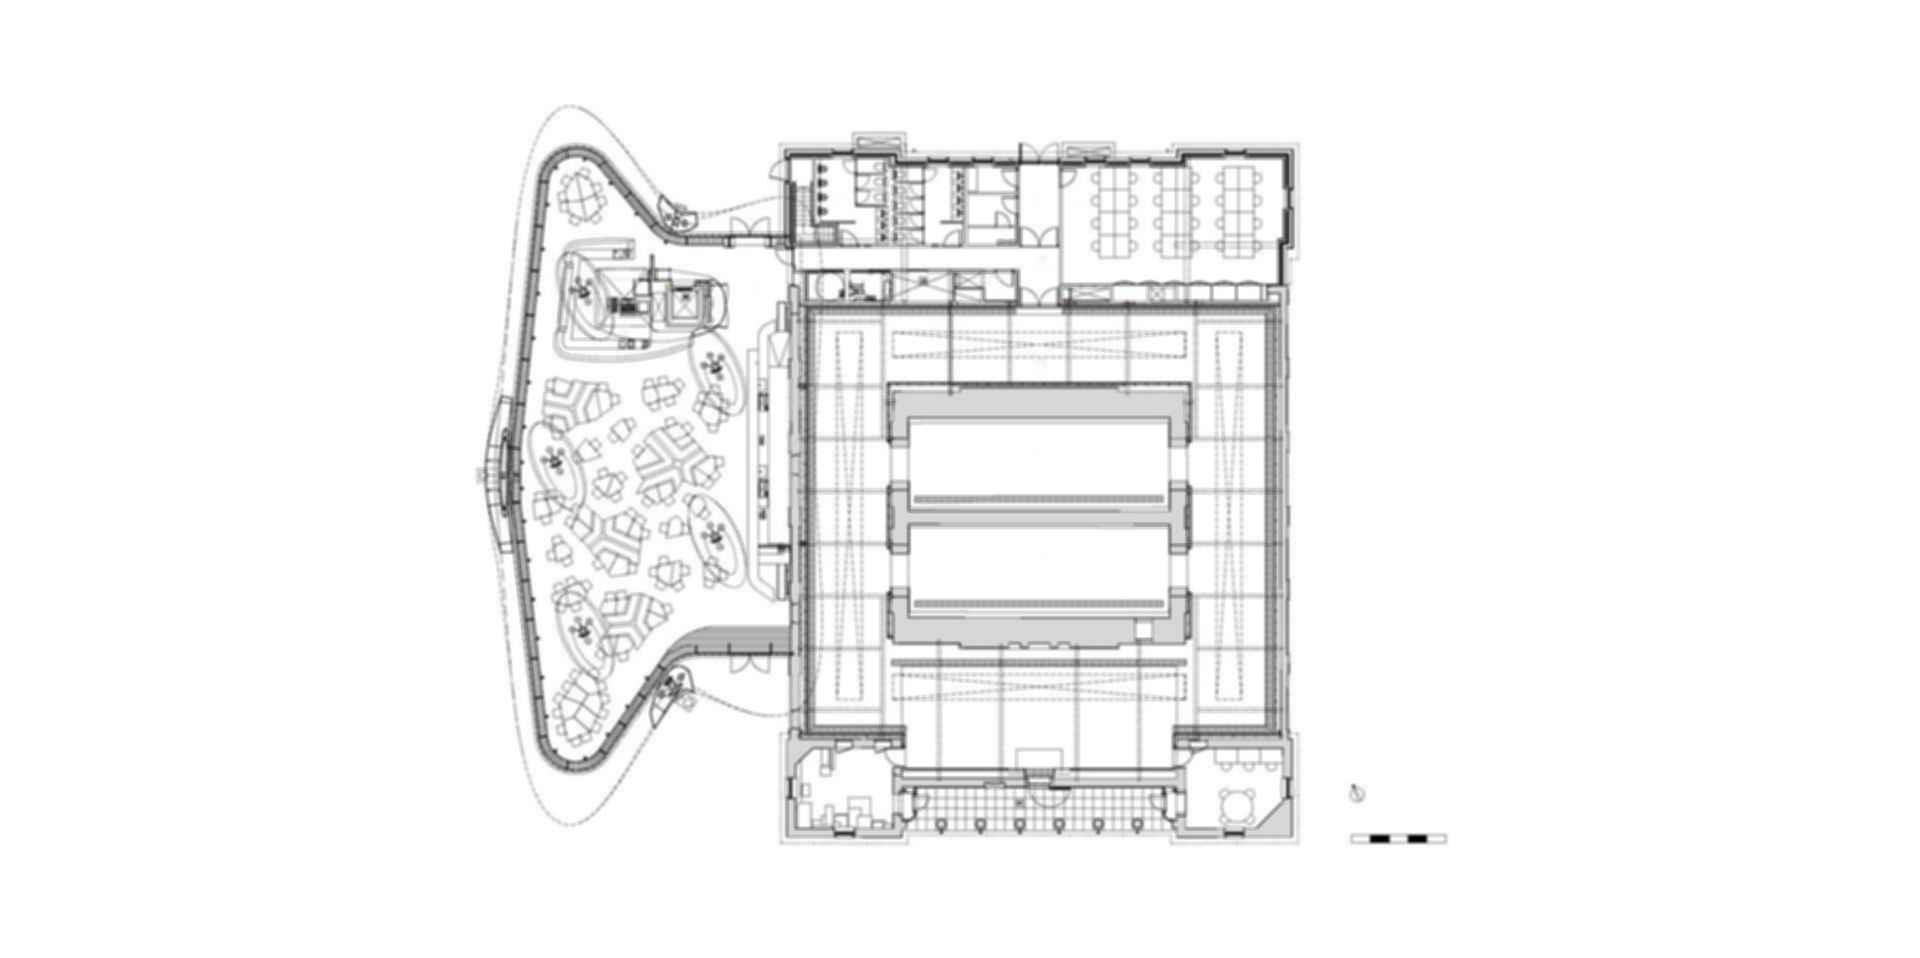 The Serpentine Sackler - Floor Plan